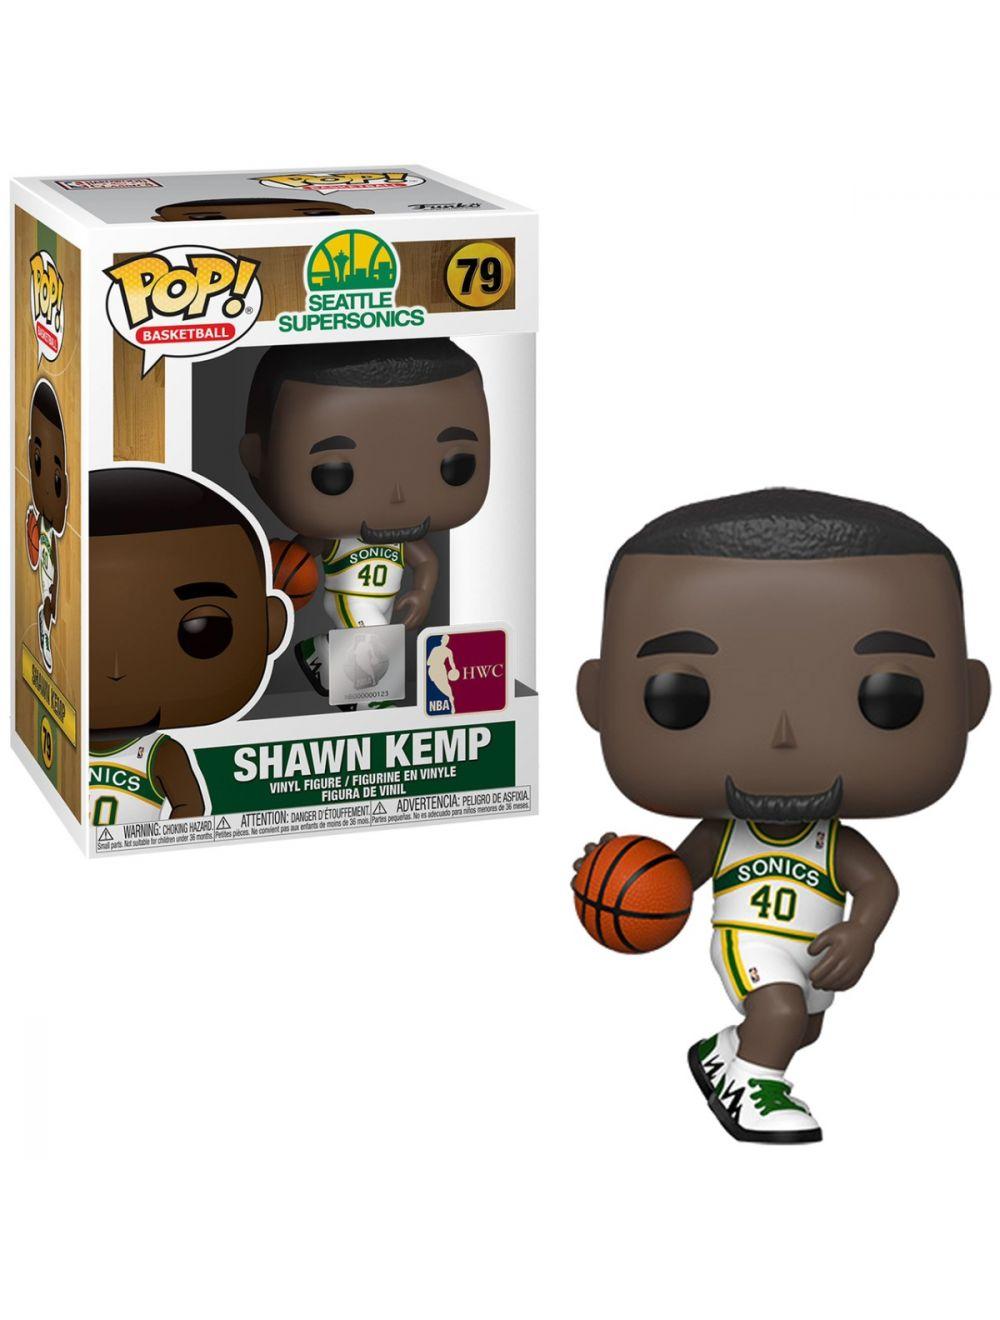 Funko POP! NBA Legends - Shawn Kemp (Sonics home) Vinyl figura 10cm